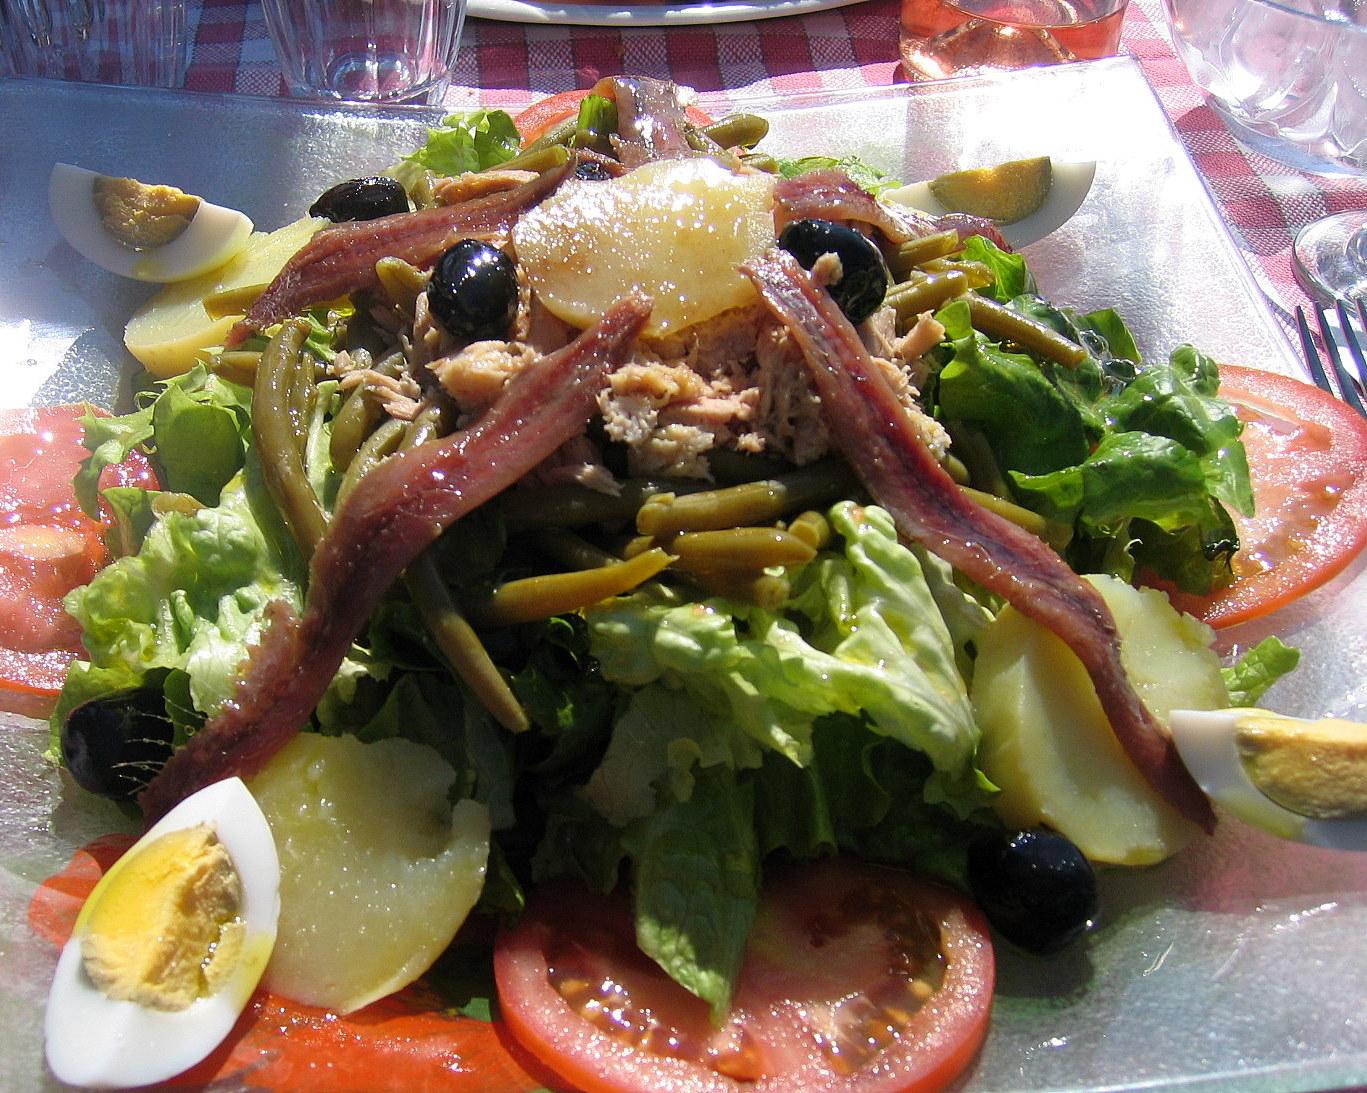 File:Salade Niçoise jenny downing.jpg